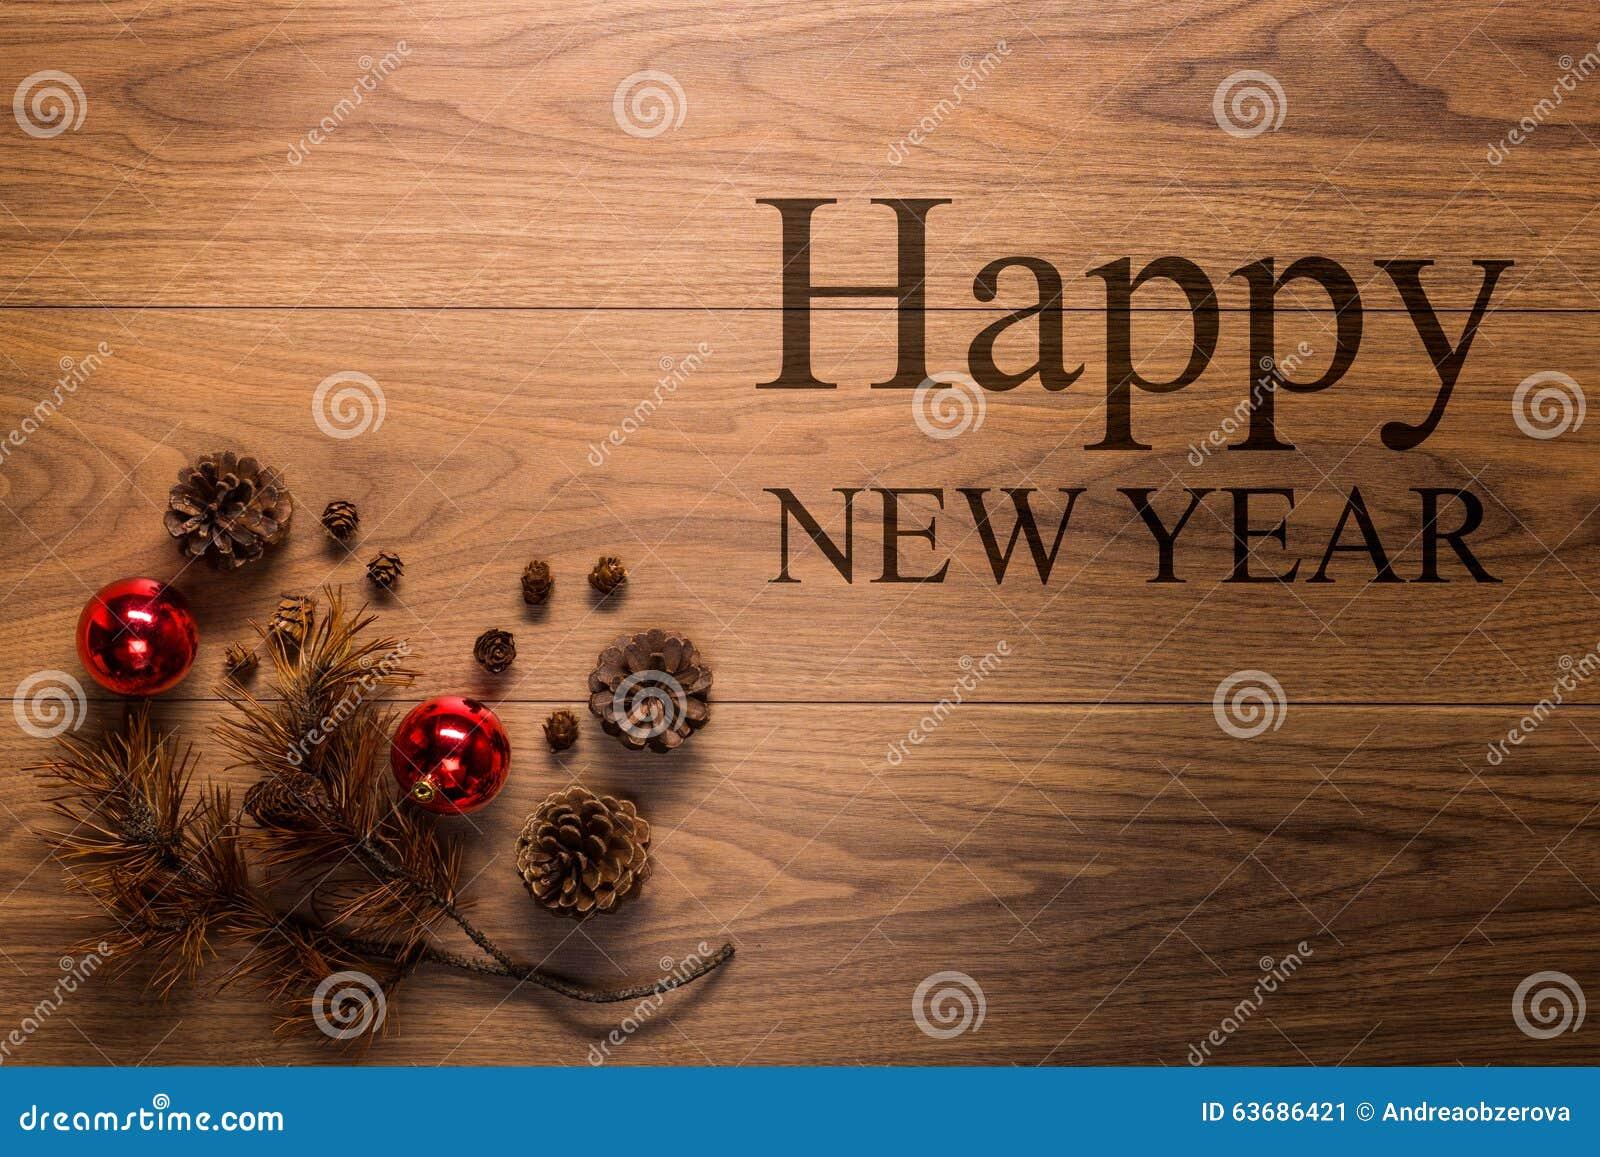 new year theme background